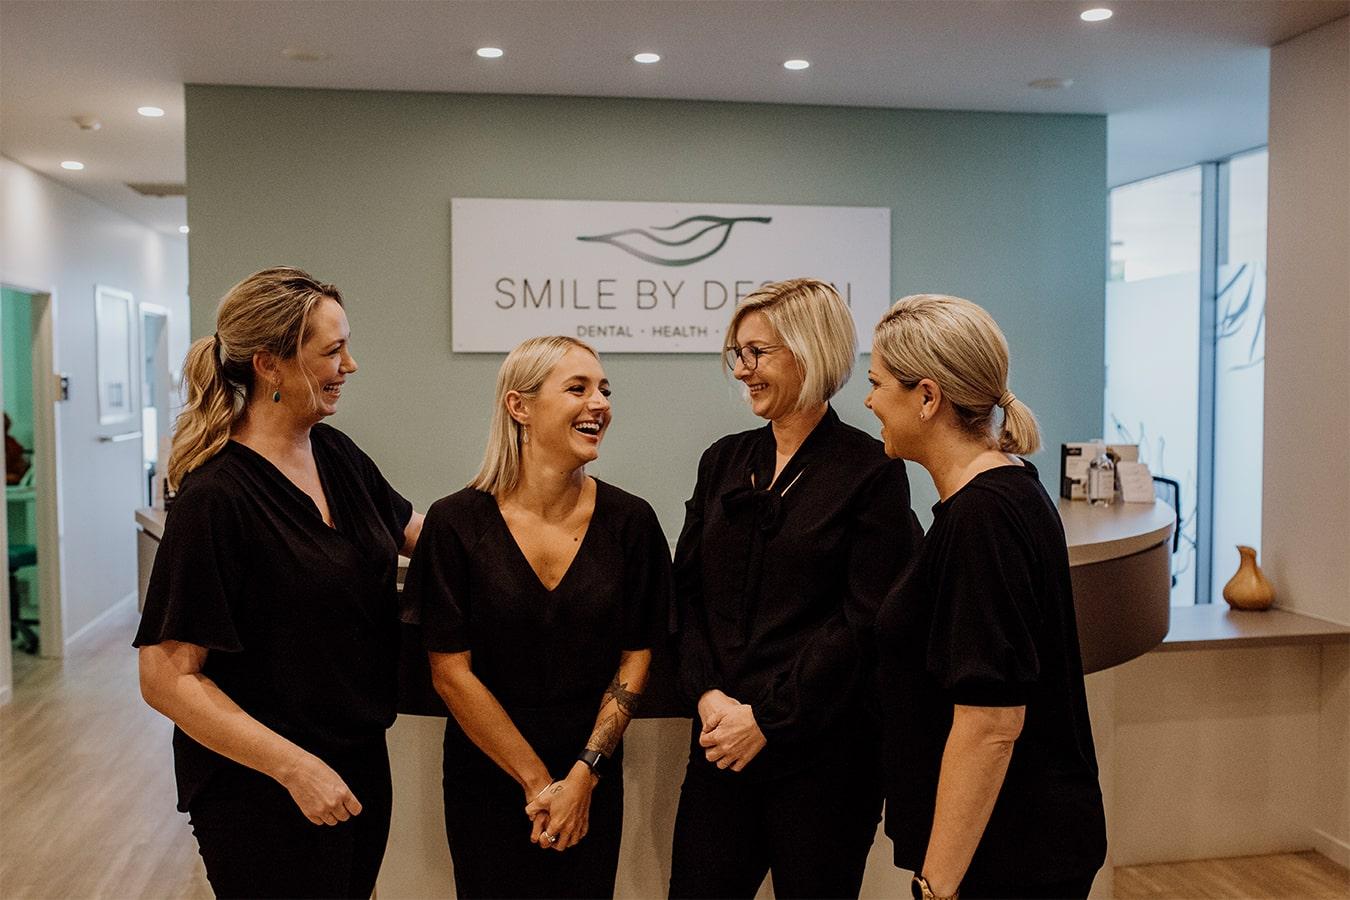 Smile by Design Team